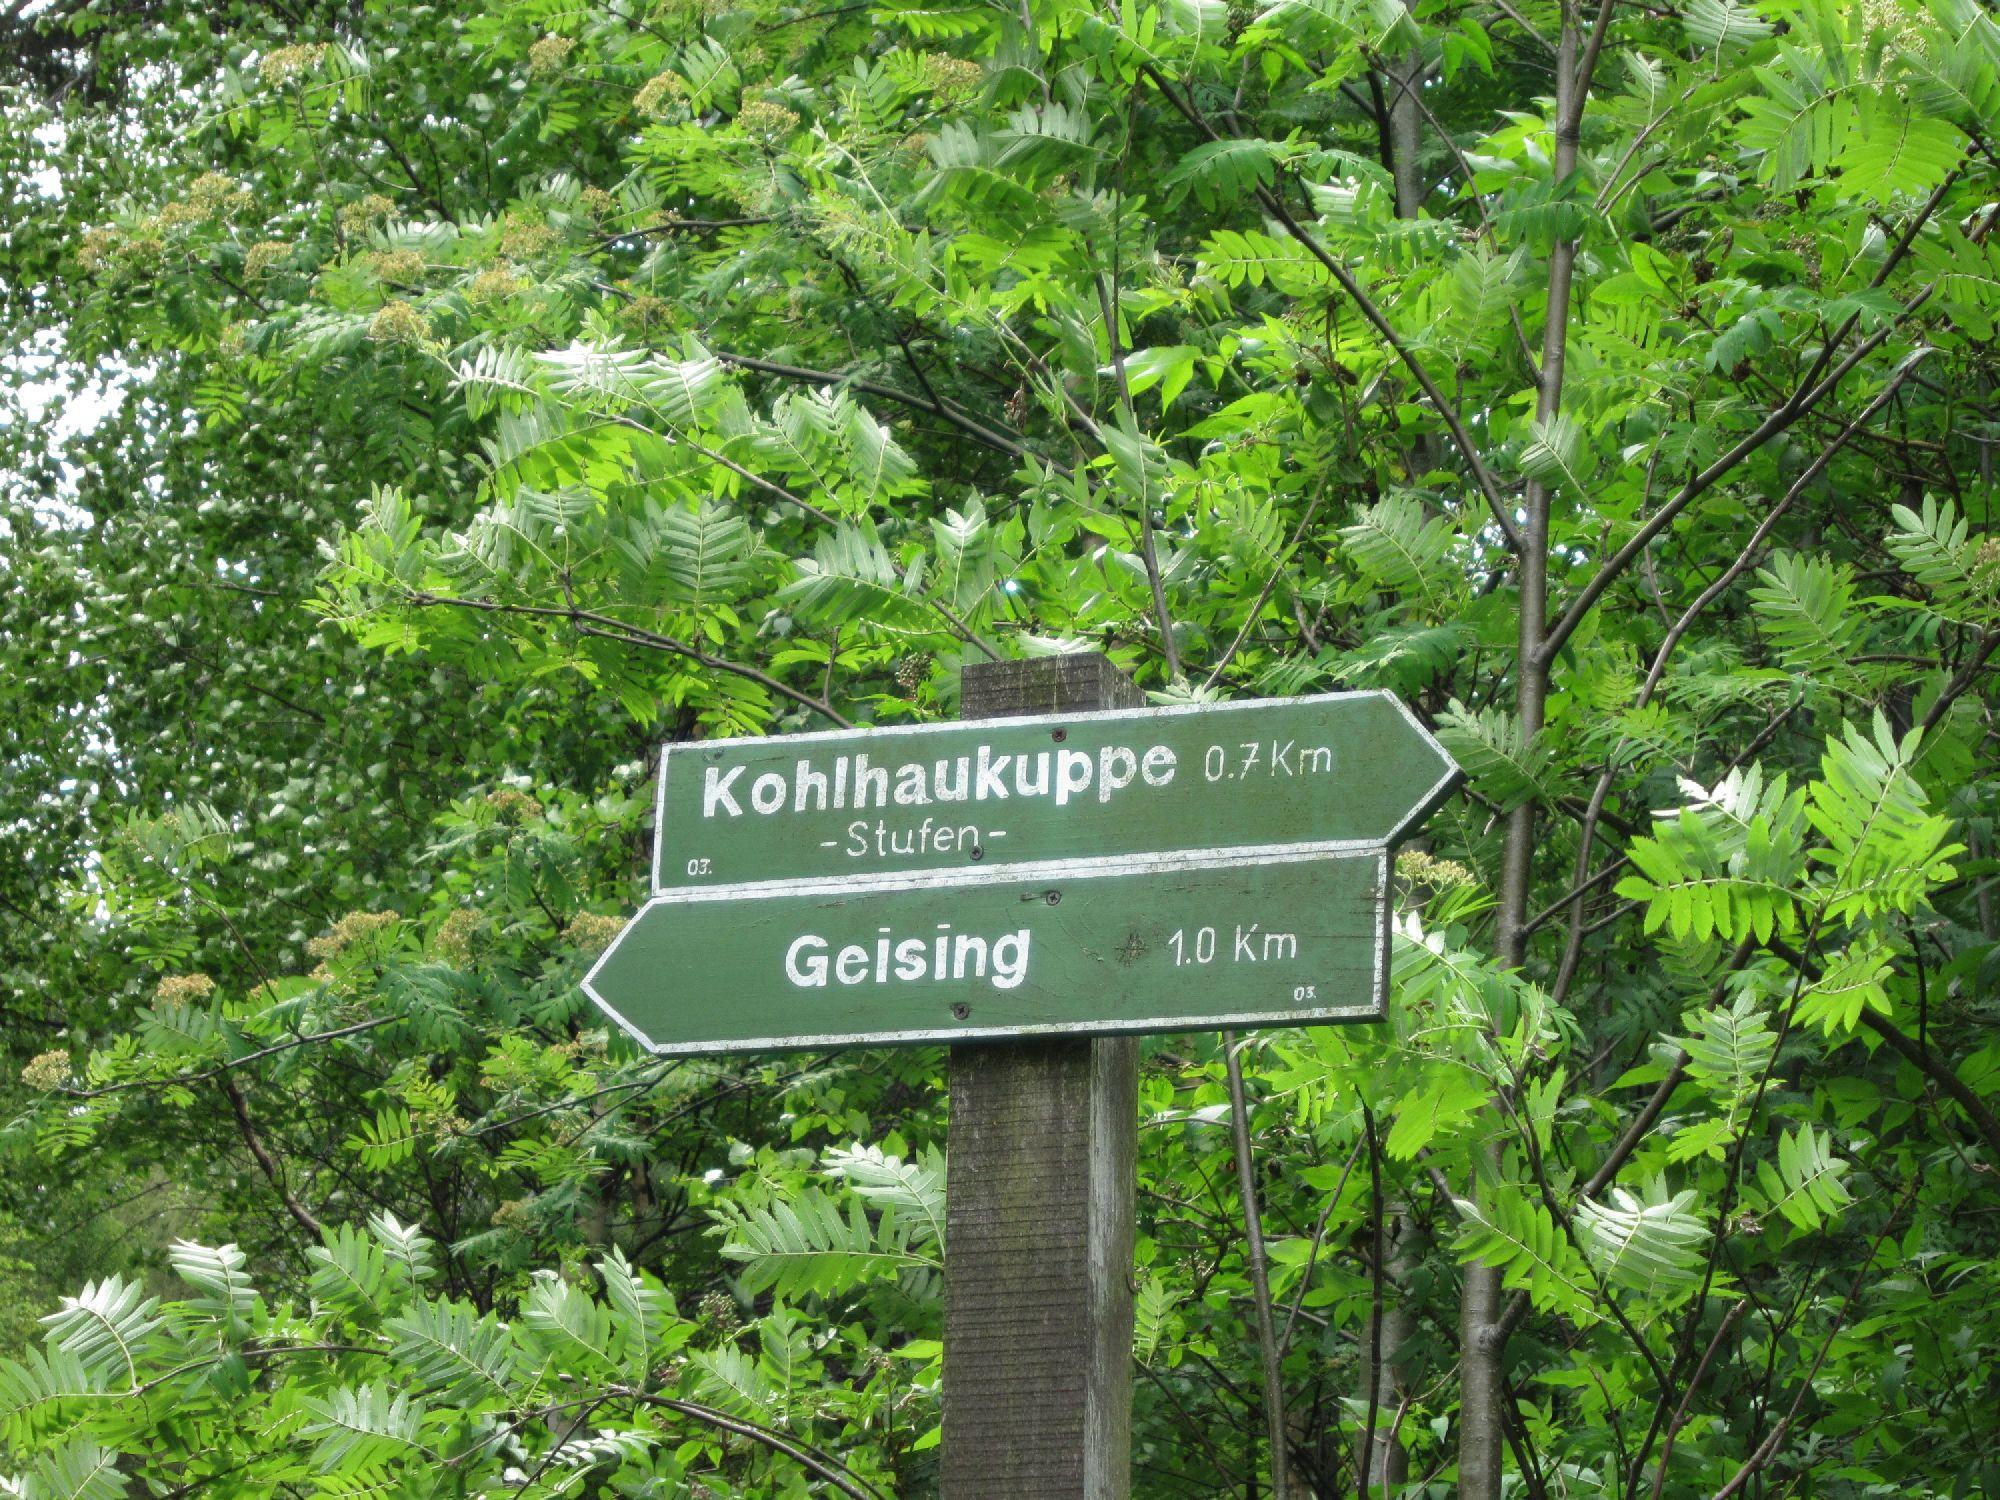 Wegweiser Kohlaukuppe/Geising